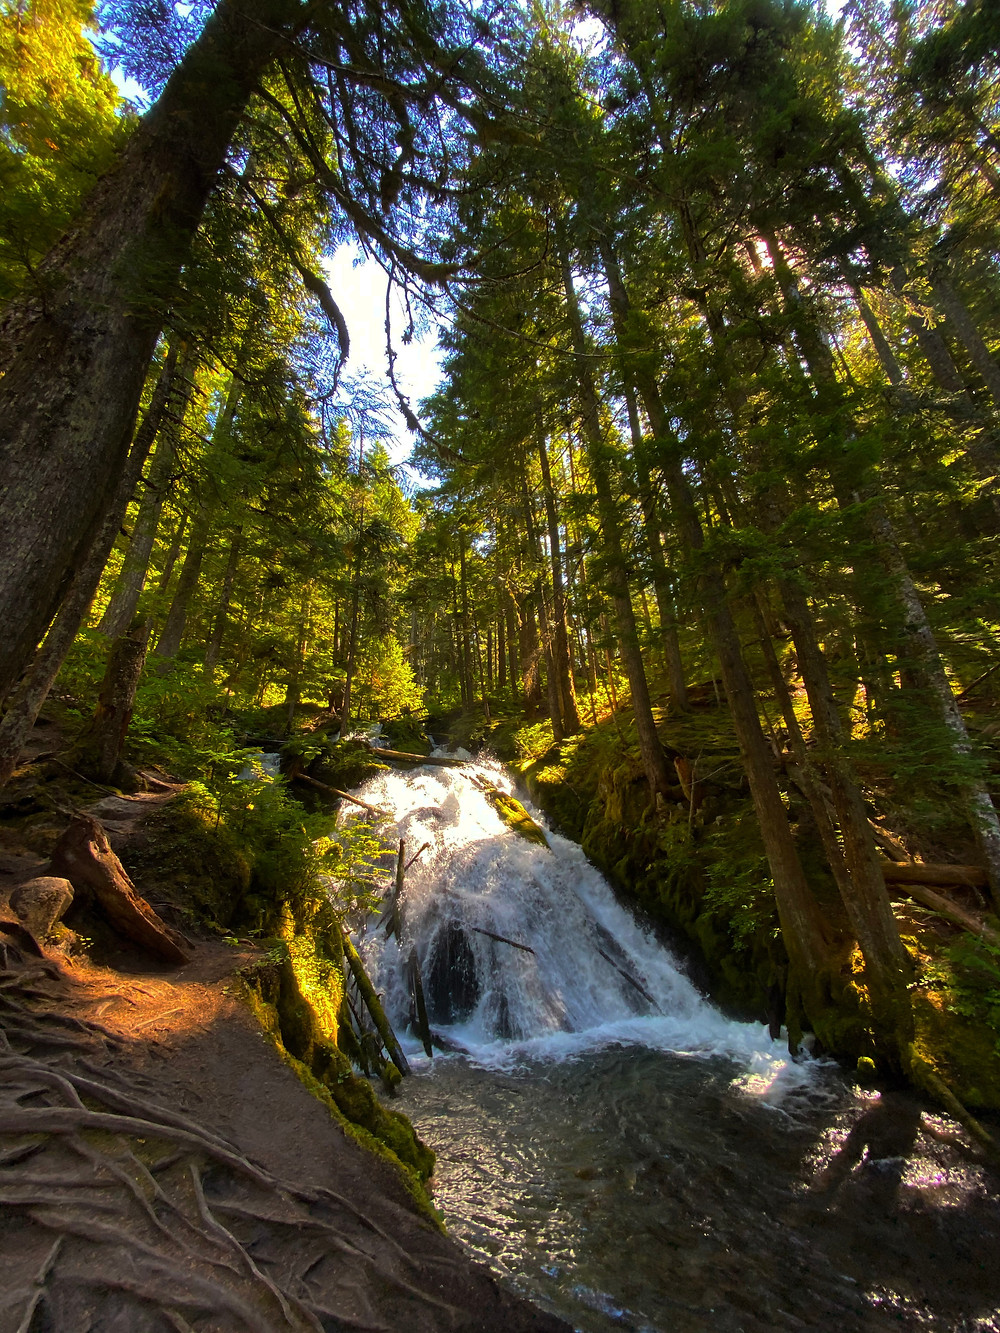 Little Zigzag Falls zigzags little-ly down the side of Mount Hood in Oregon